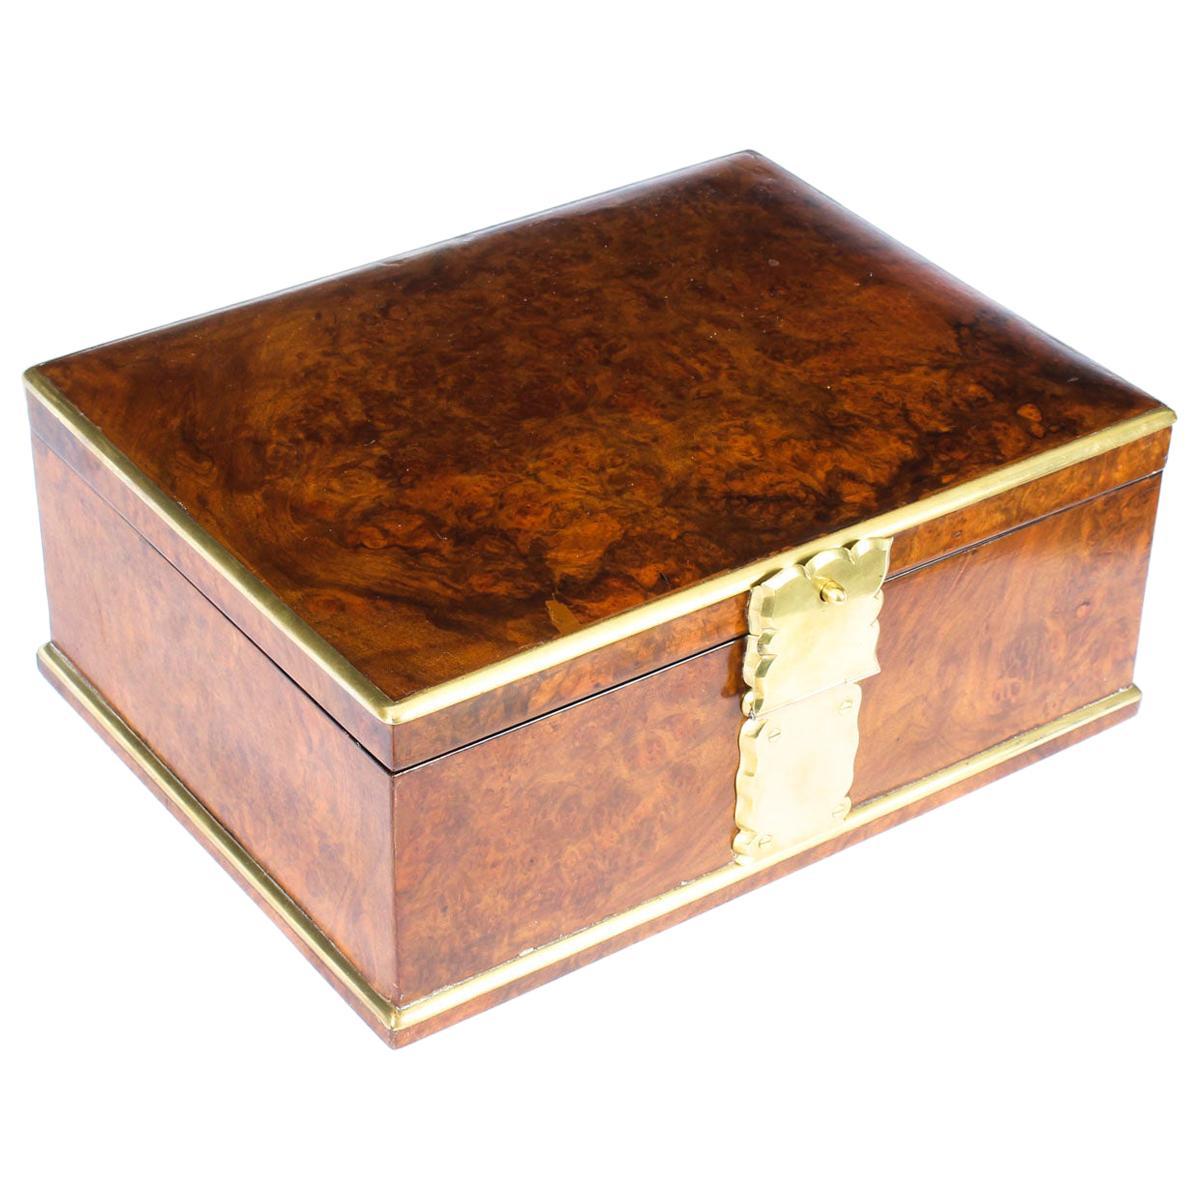 Antique Victorian Aspreys Burr Walnut Casket Jewelry Box, 19th Century